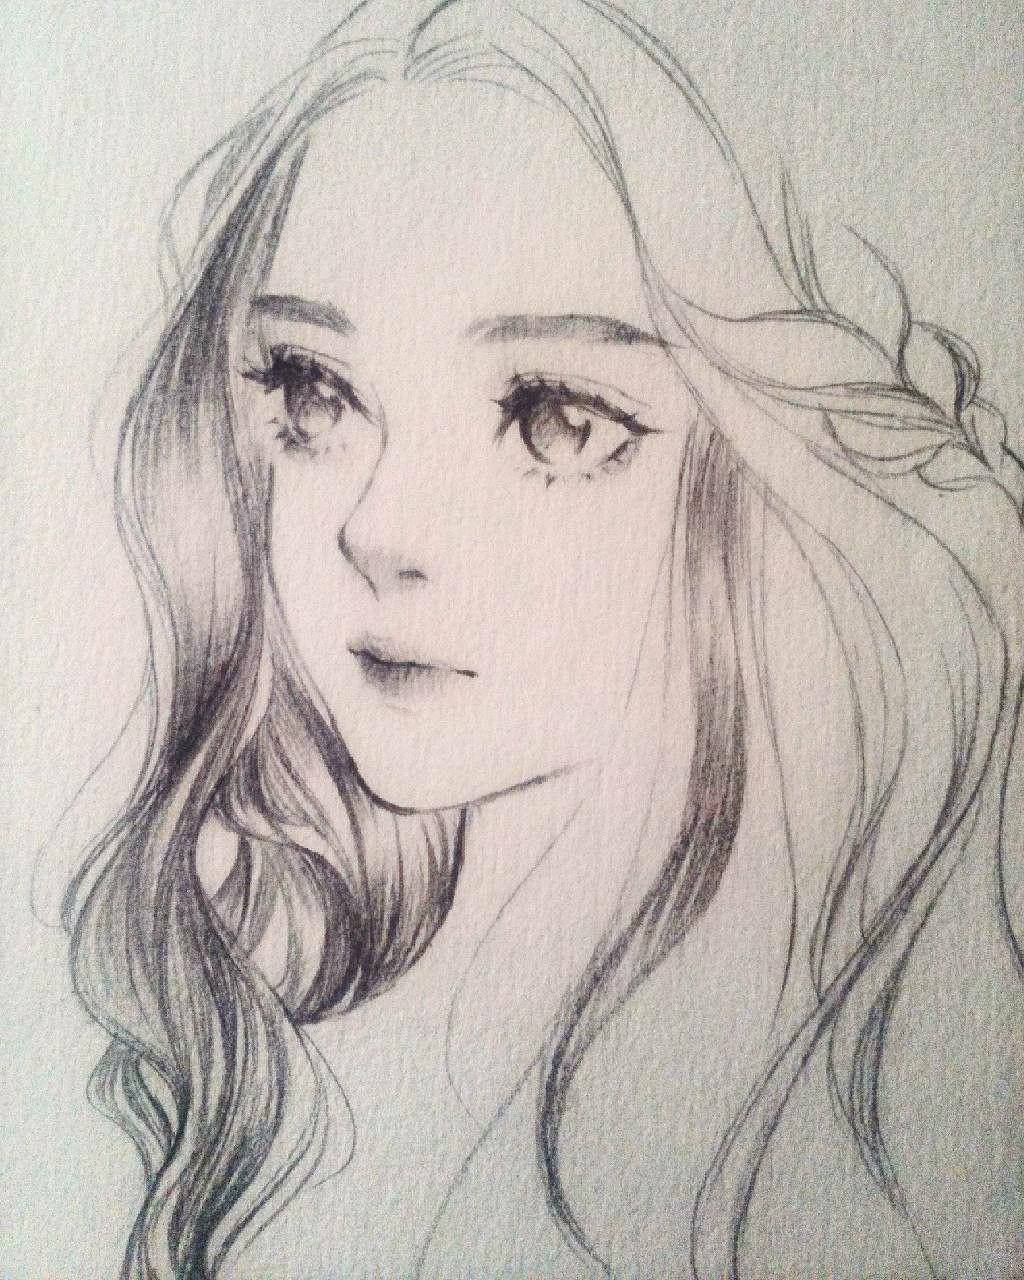 Pin by Nanimy Vũ on Manga Pinterest Drawings, Anime